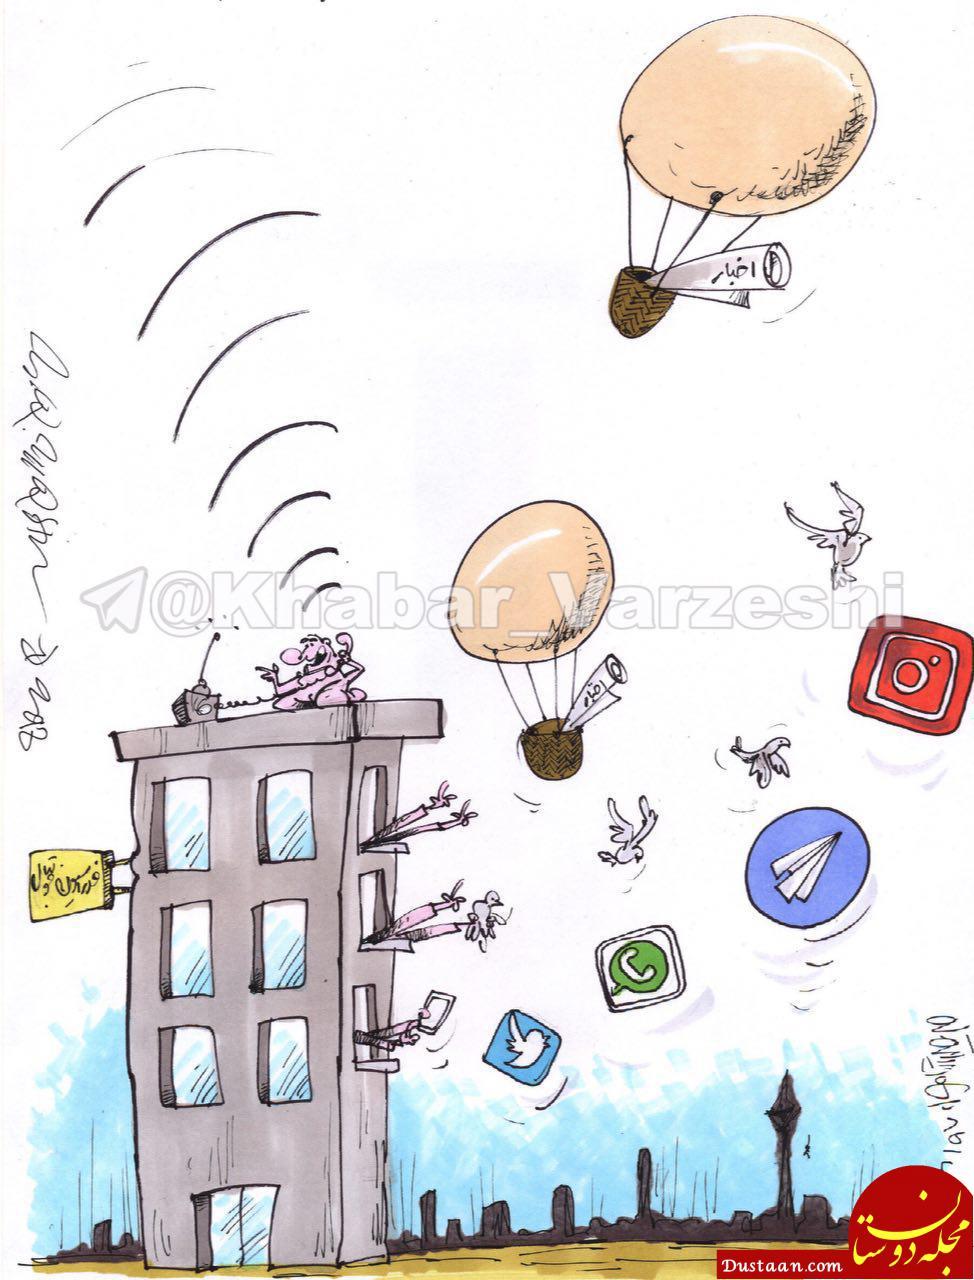 www.dustaan.com کی روش به تاج: یک نفر اخبار فدراسیون را بیرون می برد؛ جاسوس را پیدا کن!